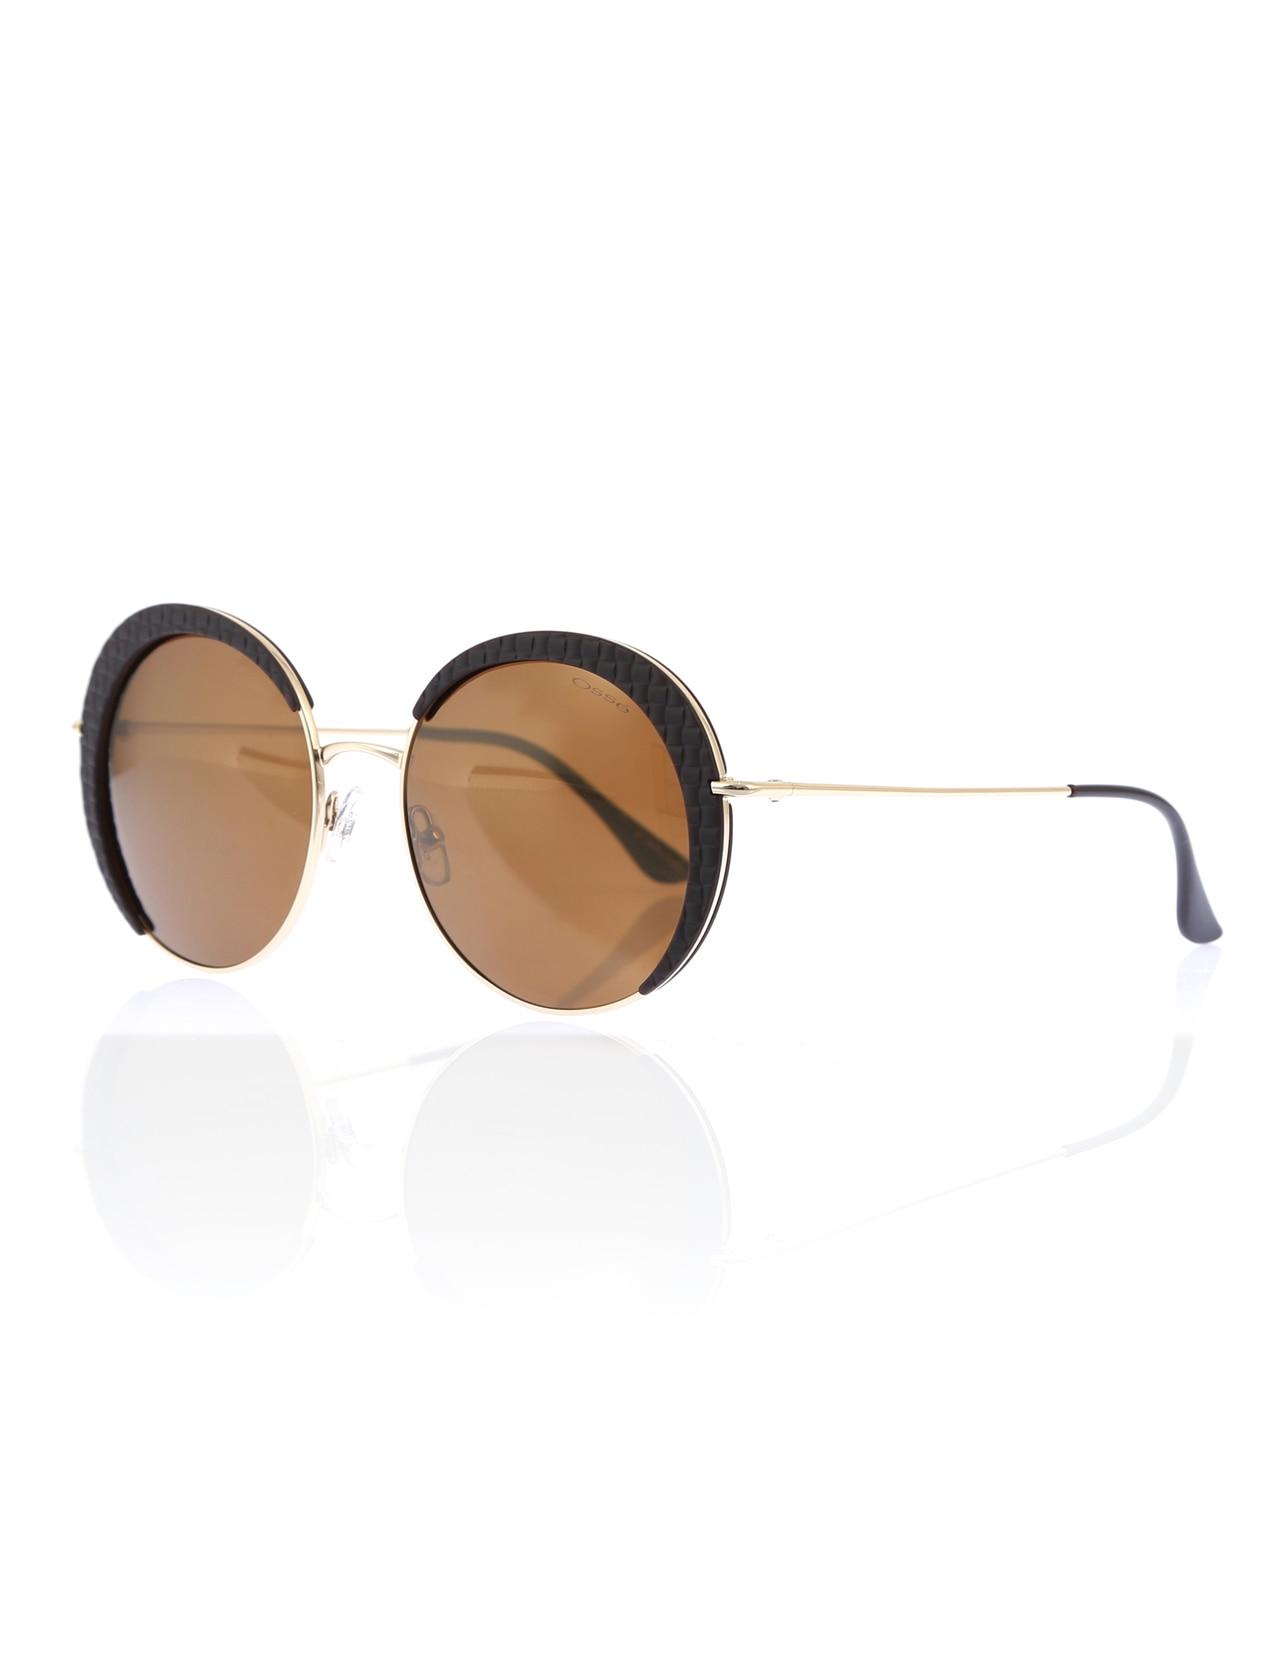 Women's sunglasses os 2936 02 metal gold organic round round 55-18-140 osse